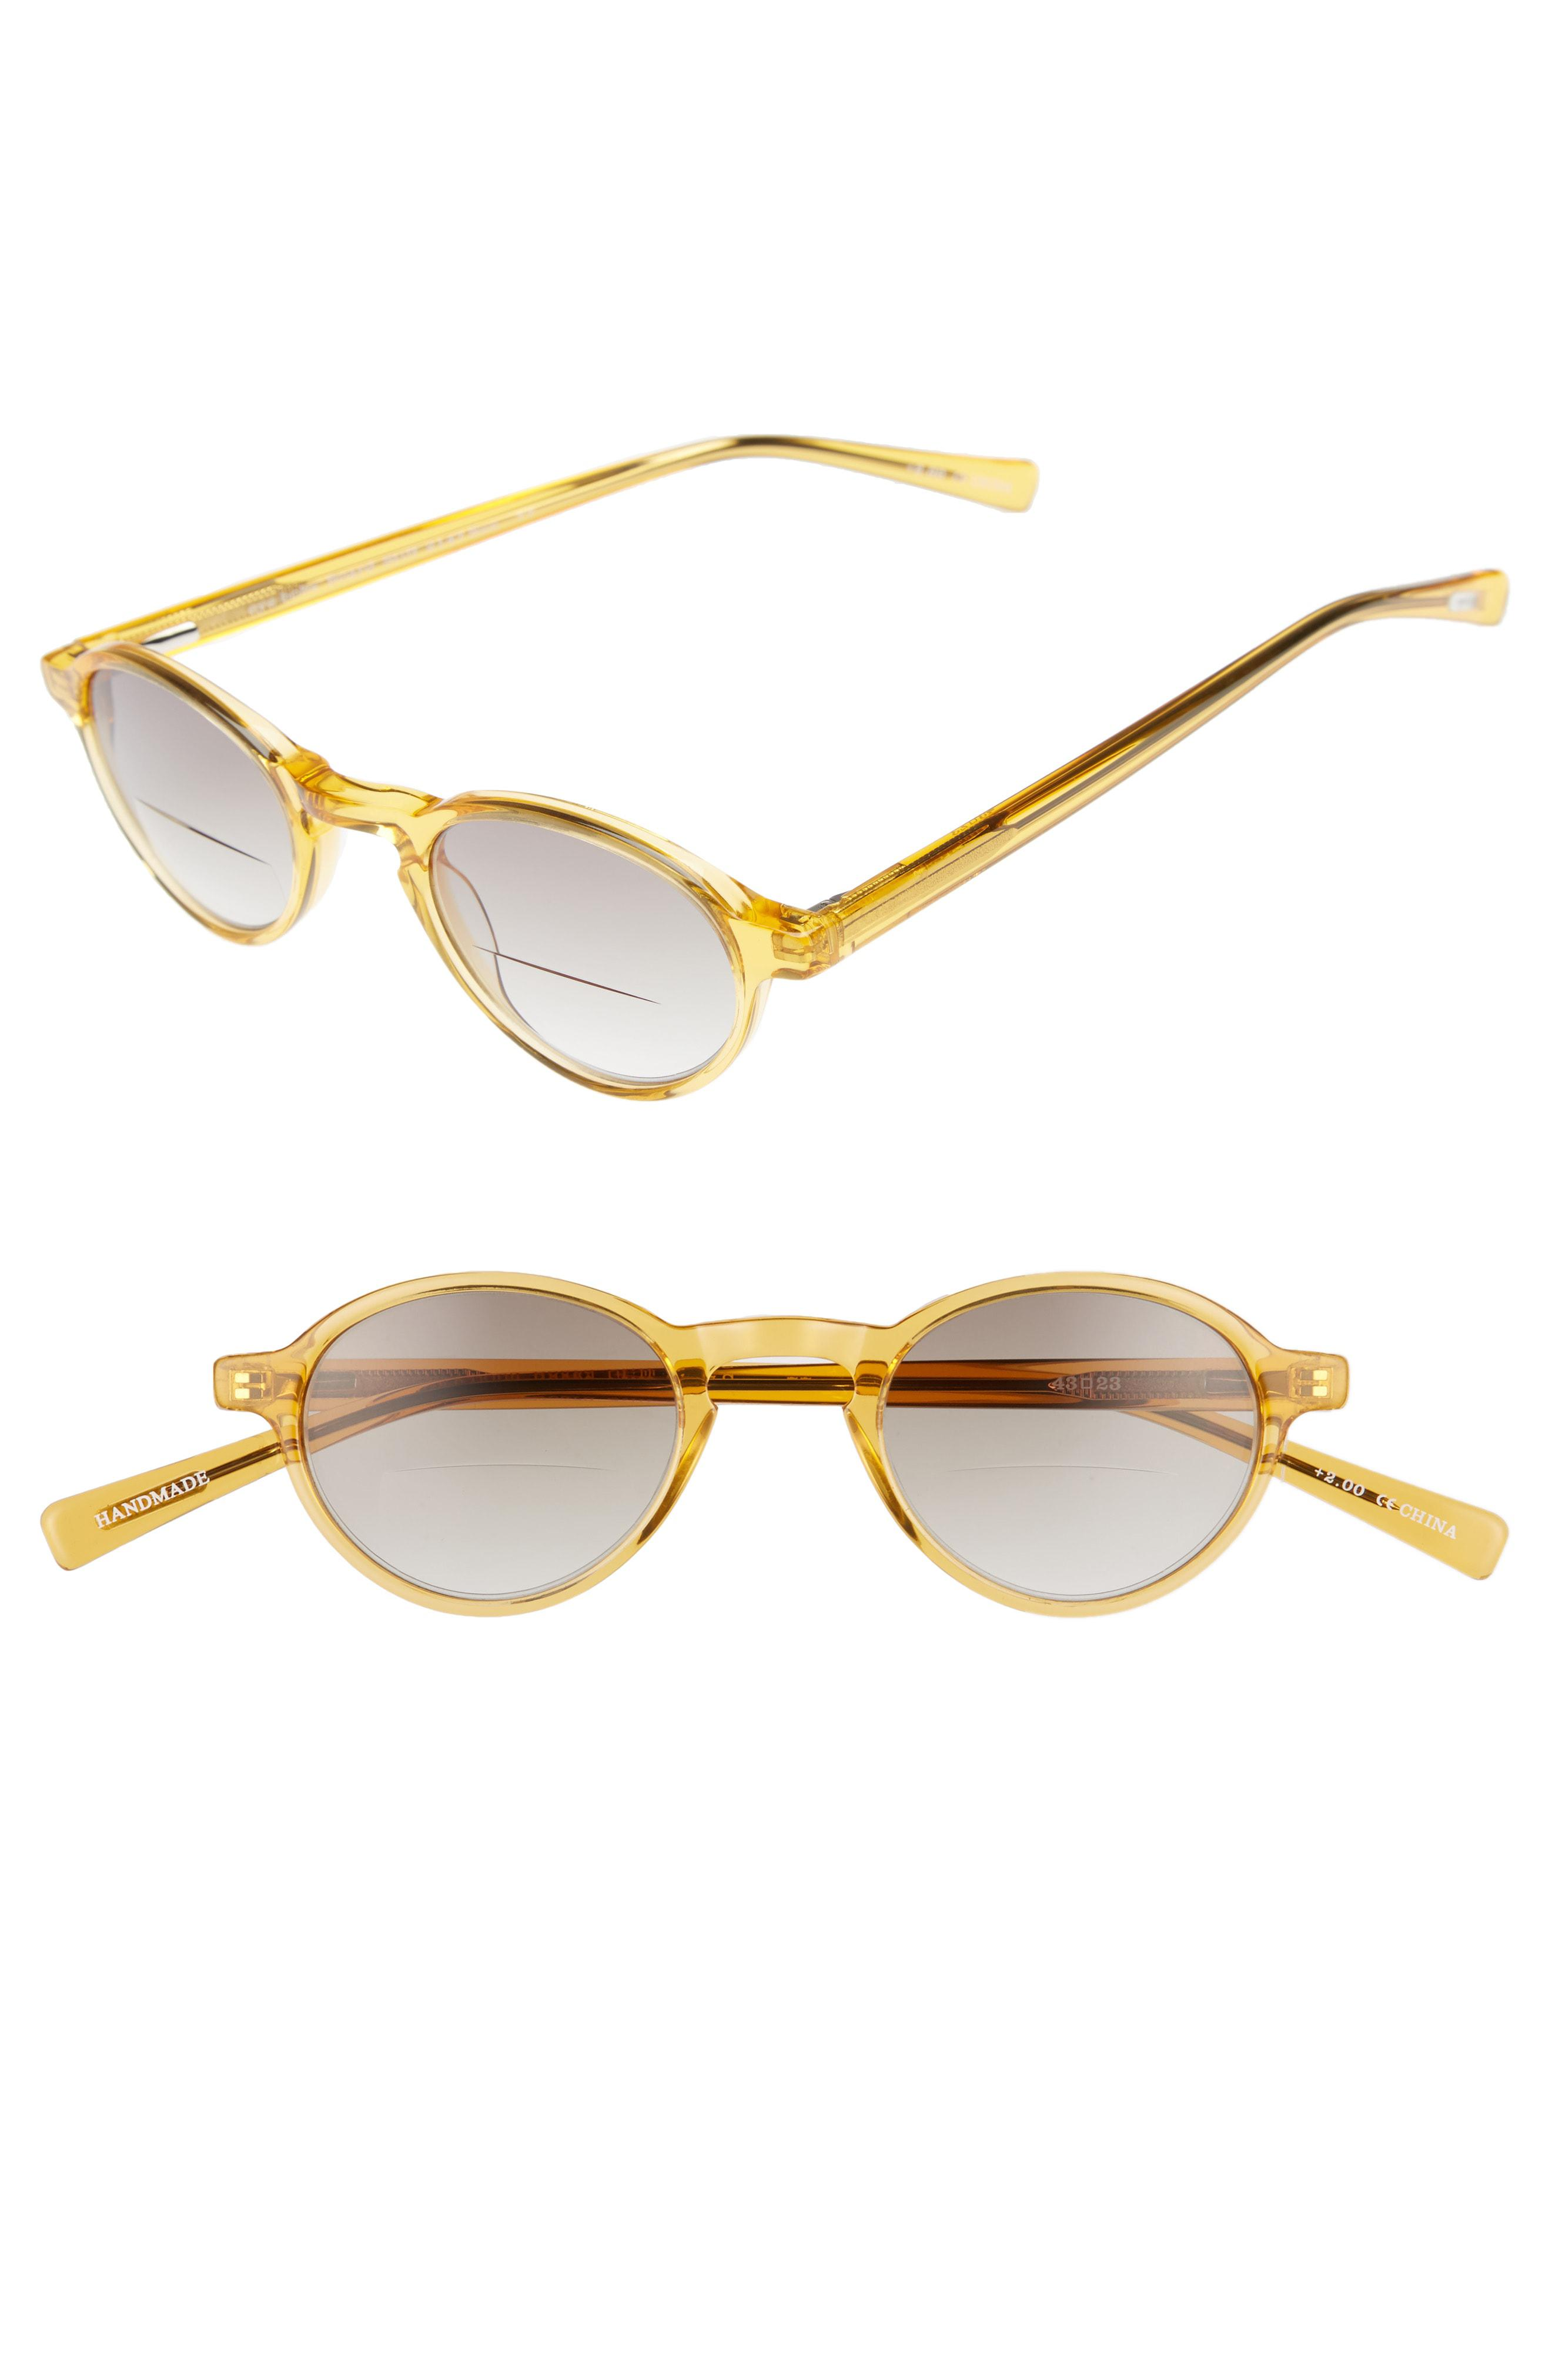 cd07509f79b8 Lyst - Eyebobs Board Stiff 43mm Reading Sunglasses - in Metallic for Men